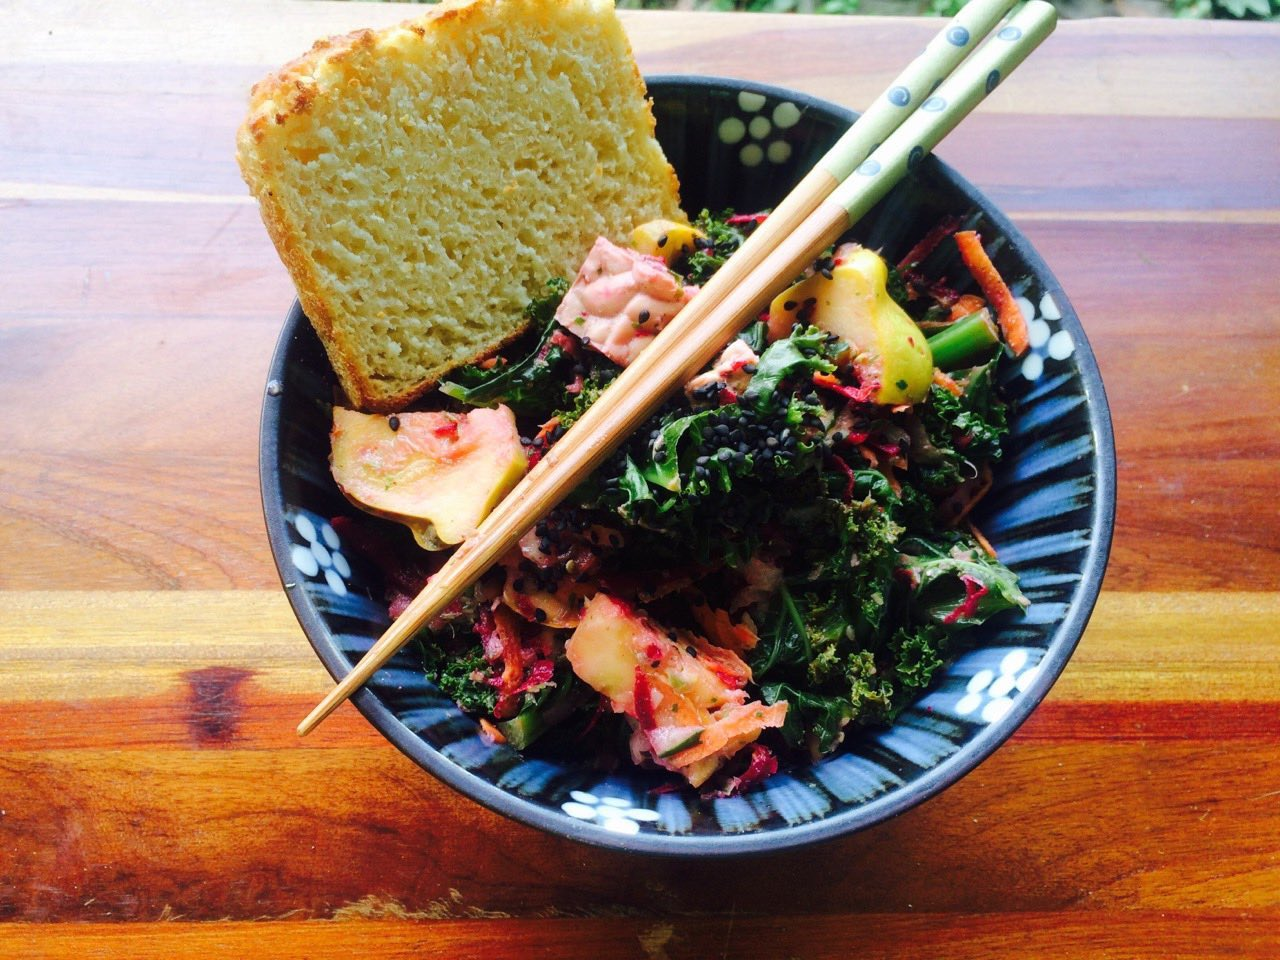 Kale salad with Squash